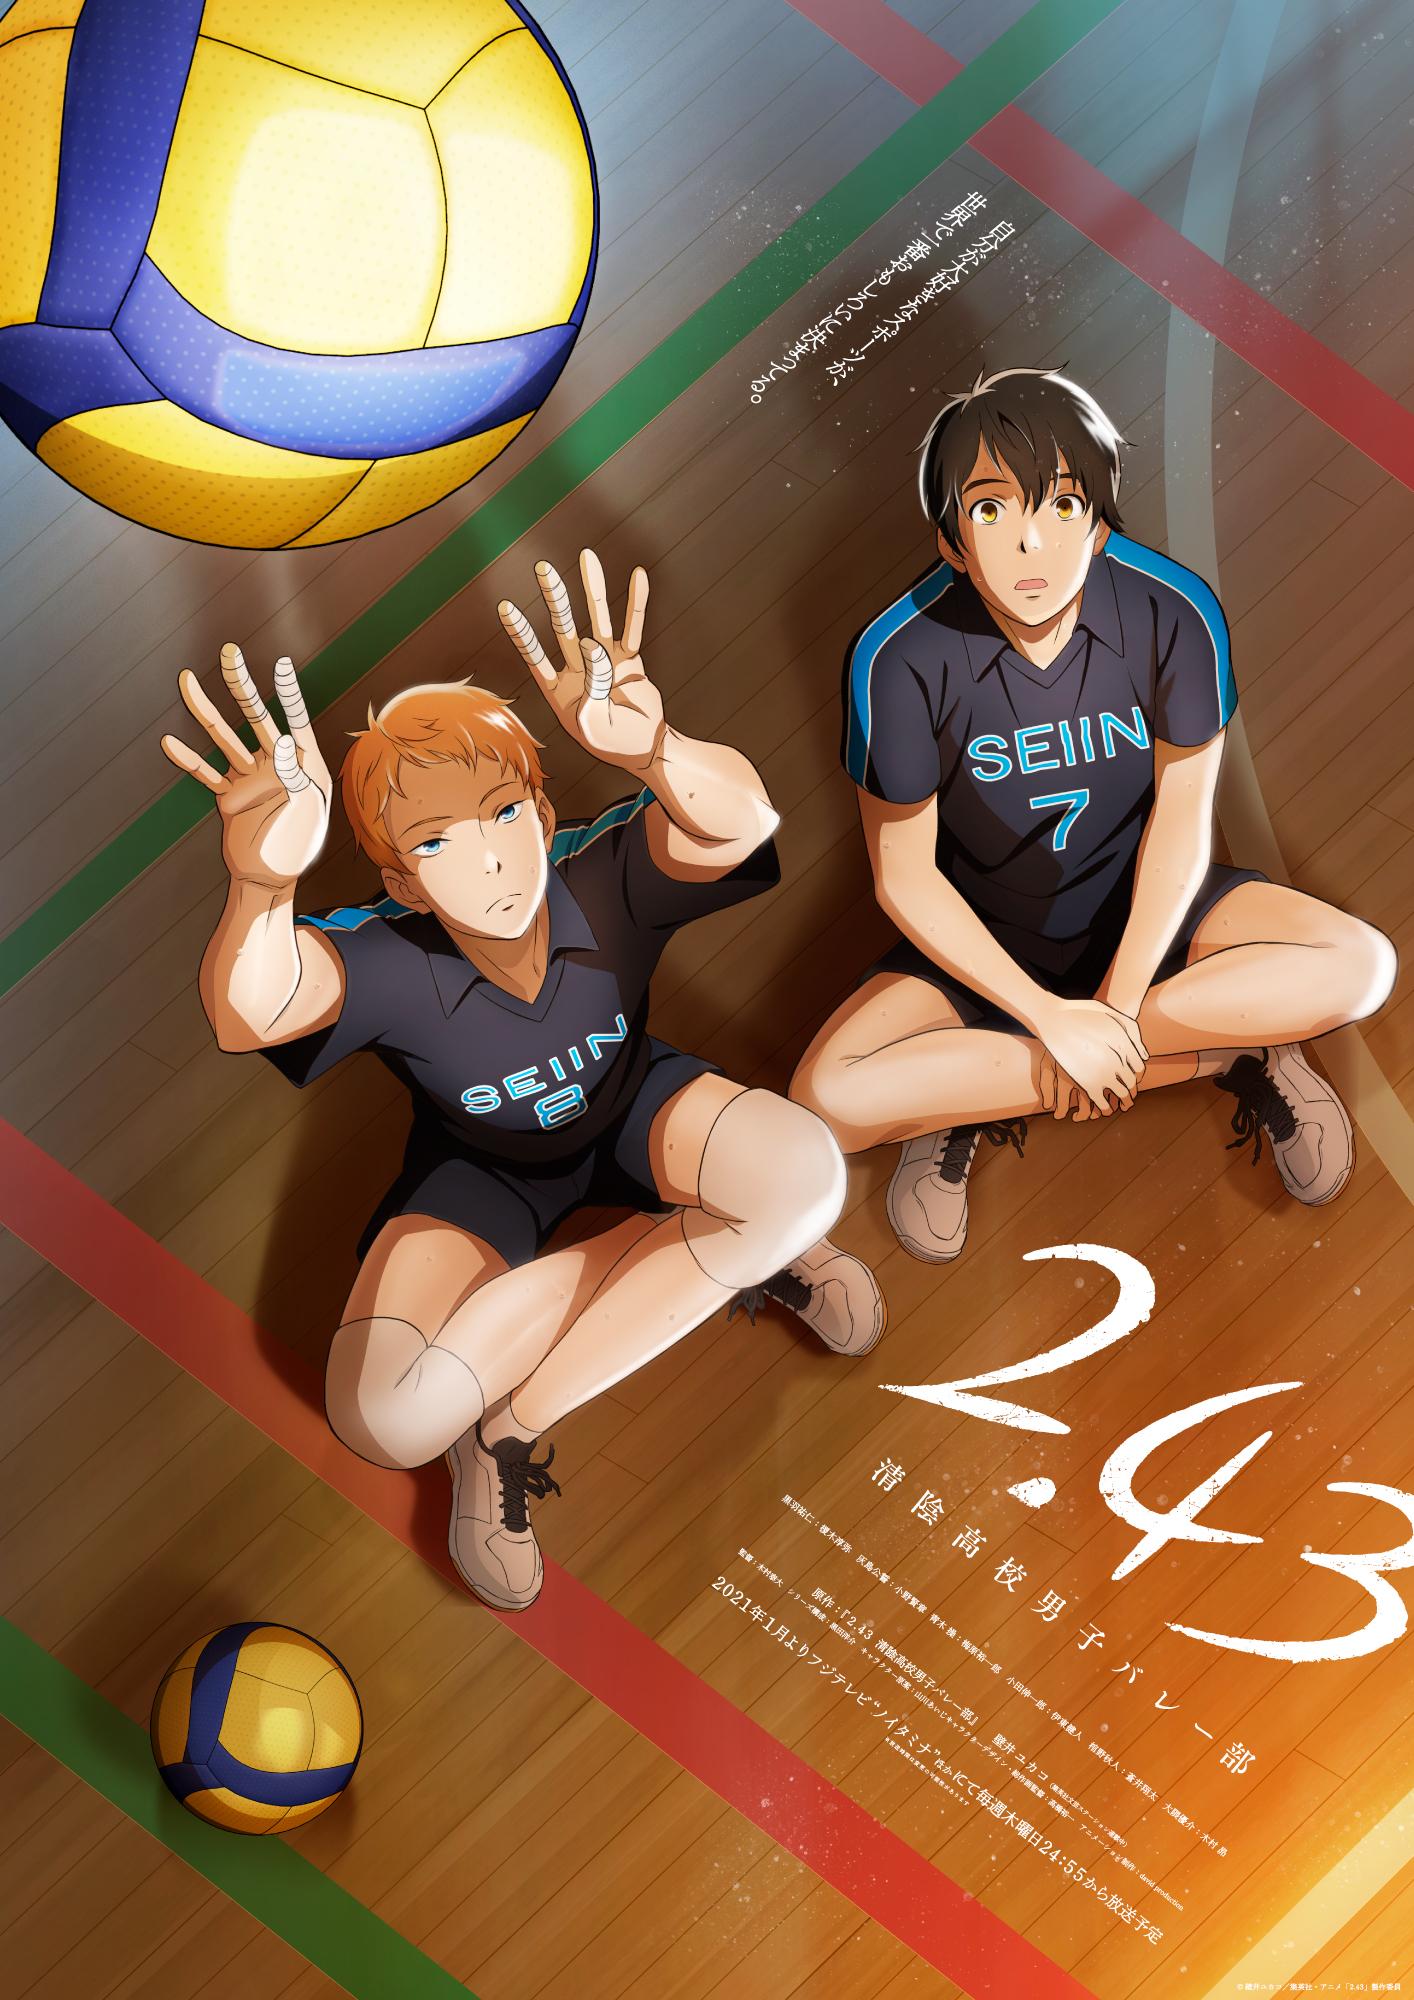 2.43-Seiin-High-School-Boys-Volleyball-Club-manga-illustration It's Not BL. Still, We Love the Sexual Tension in 2.43: Seiin High School Boys Volleyball Club!